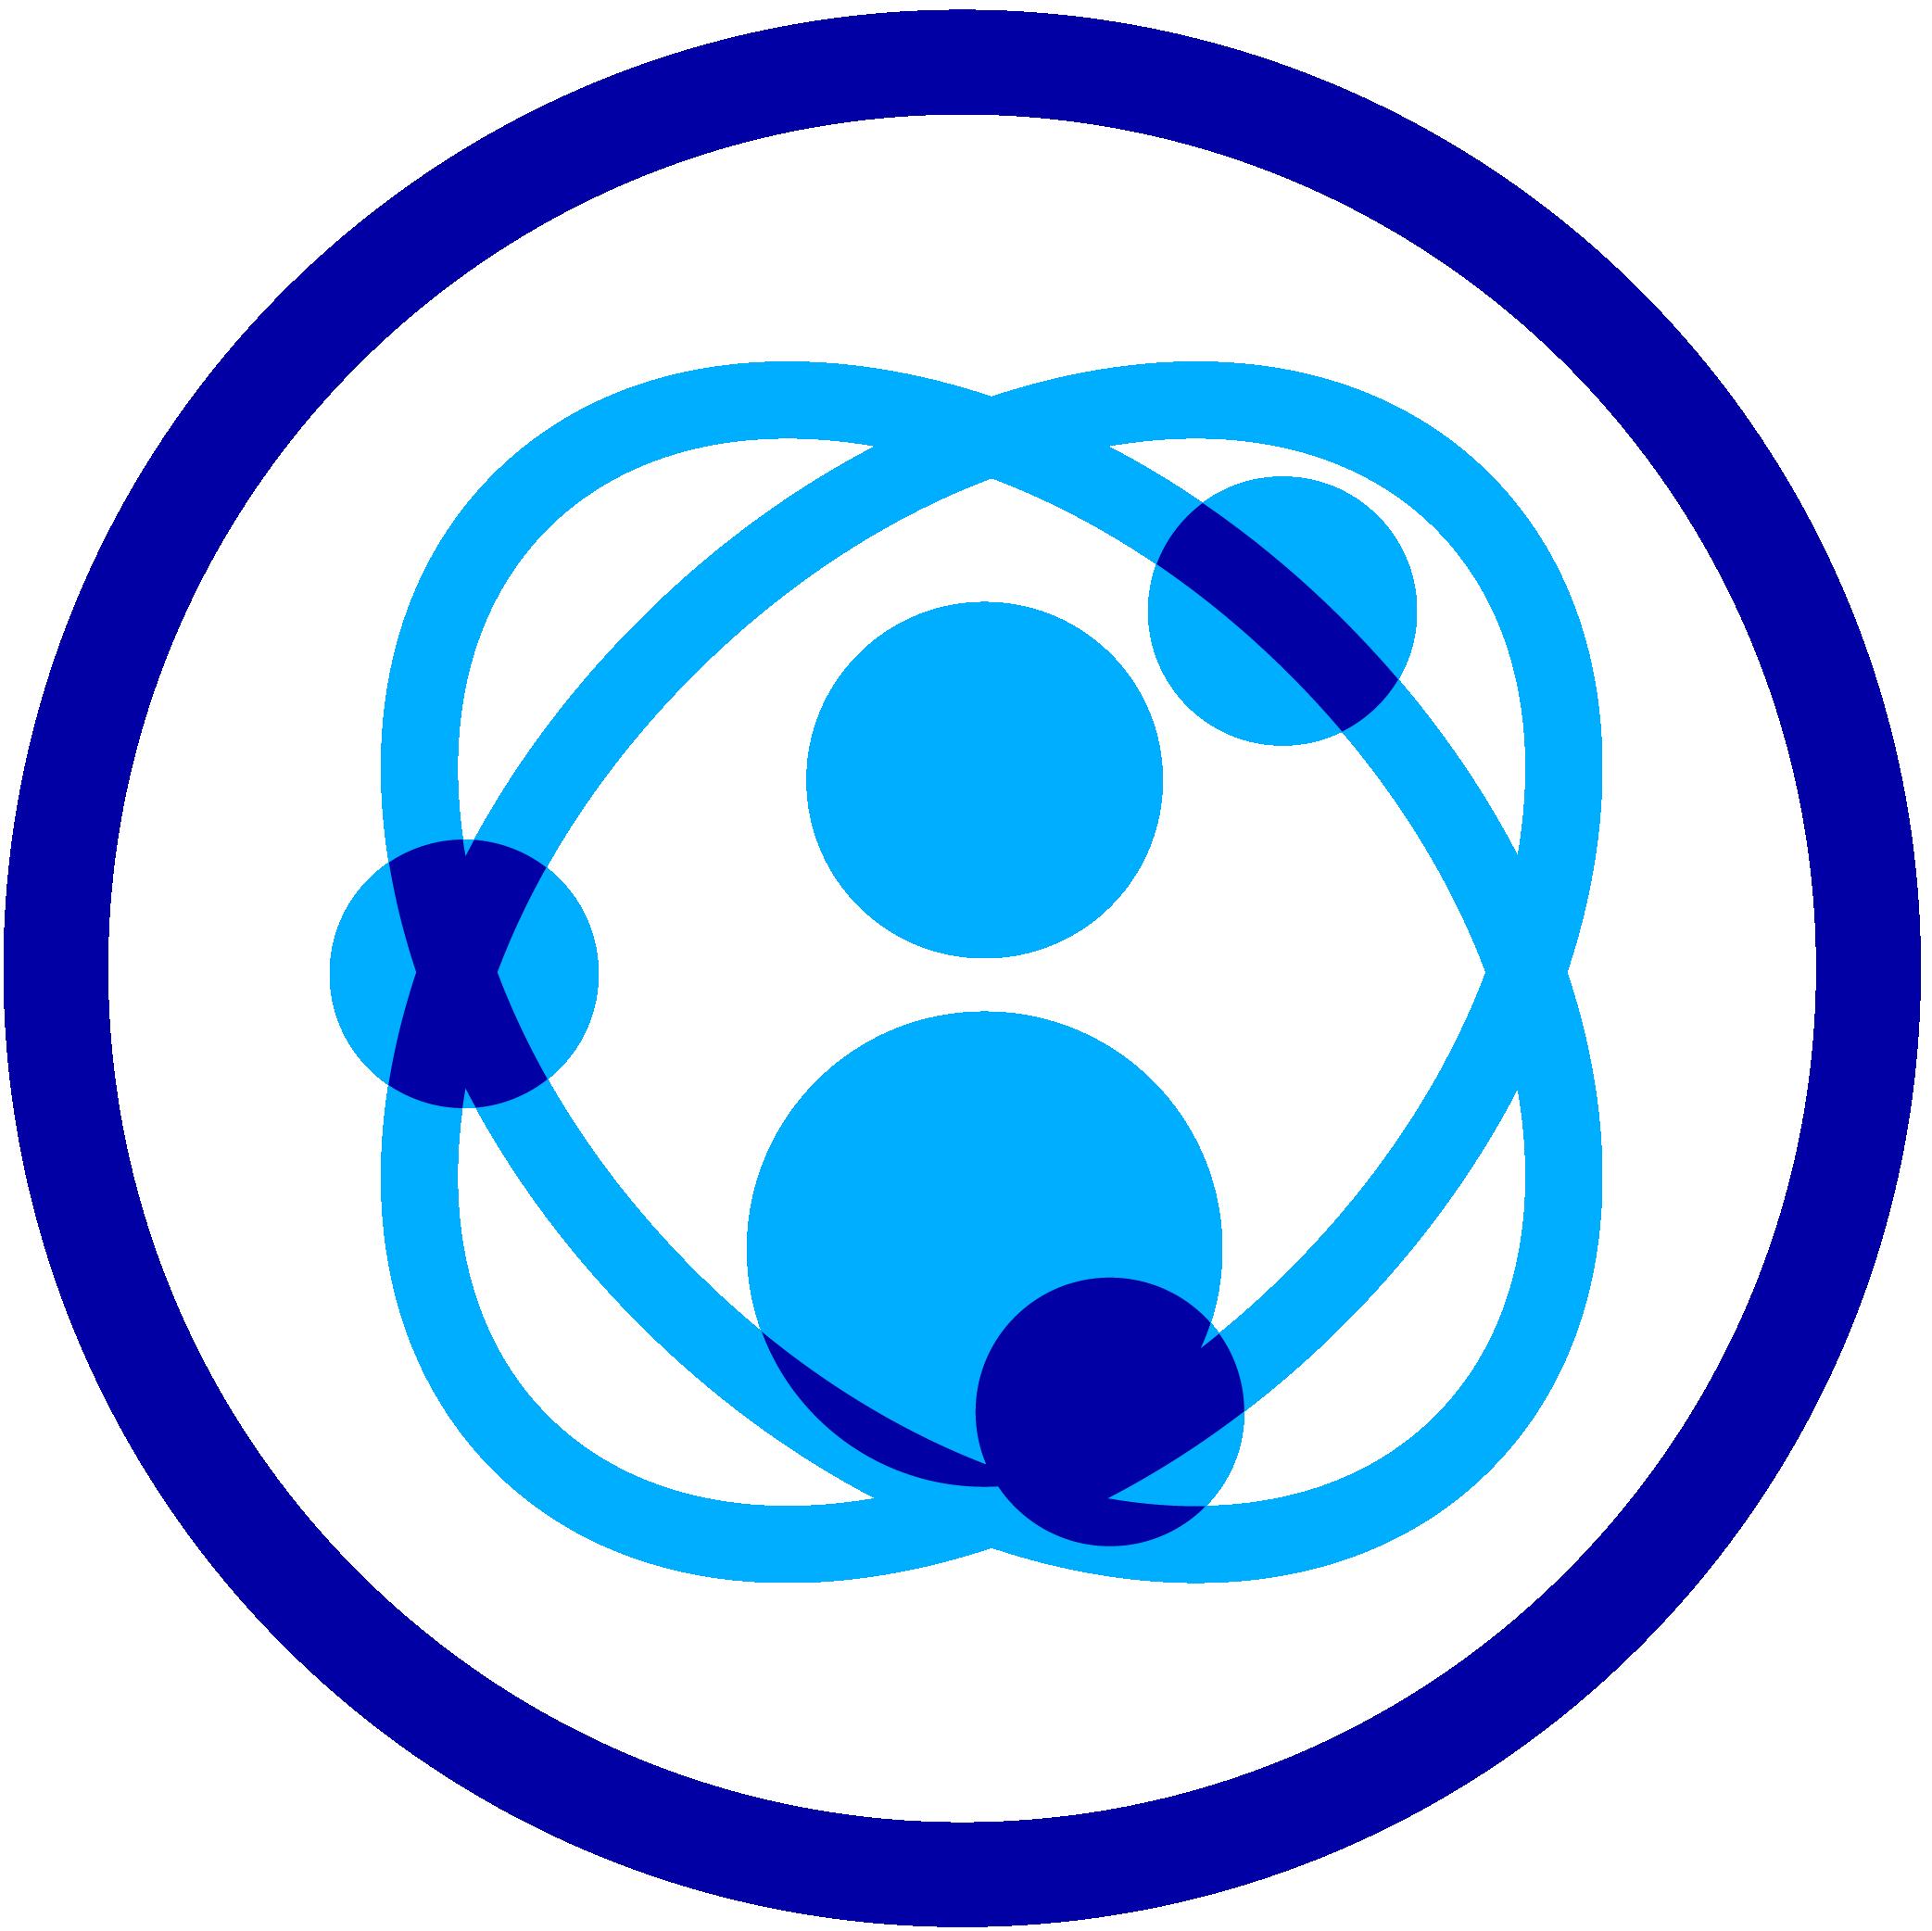 https://ca.fi-group.com/wp-content/uploads/sites/5/2021/02/blue-icons-set_1-55.png